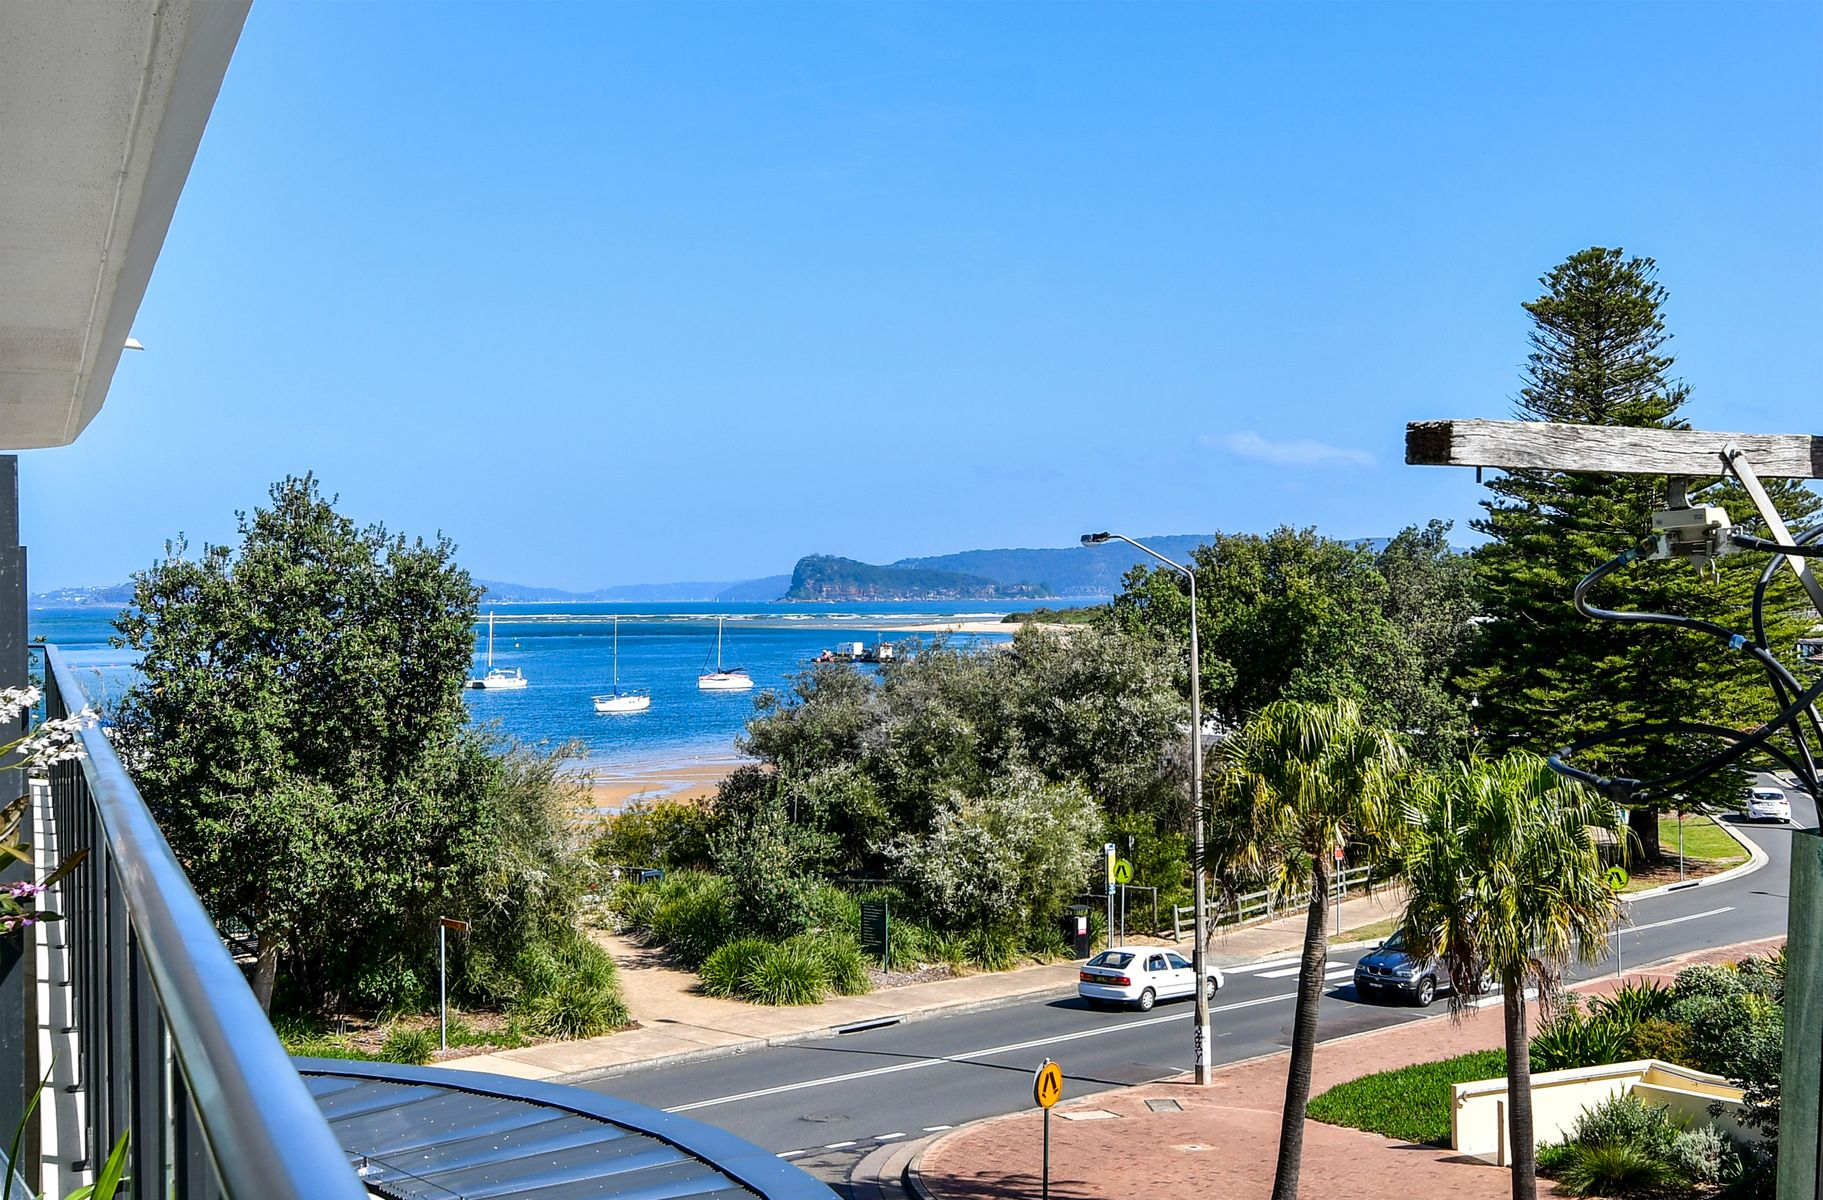 215/47-49 The Esplanade, Ettalong Beach, NSW 2257